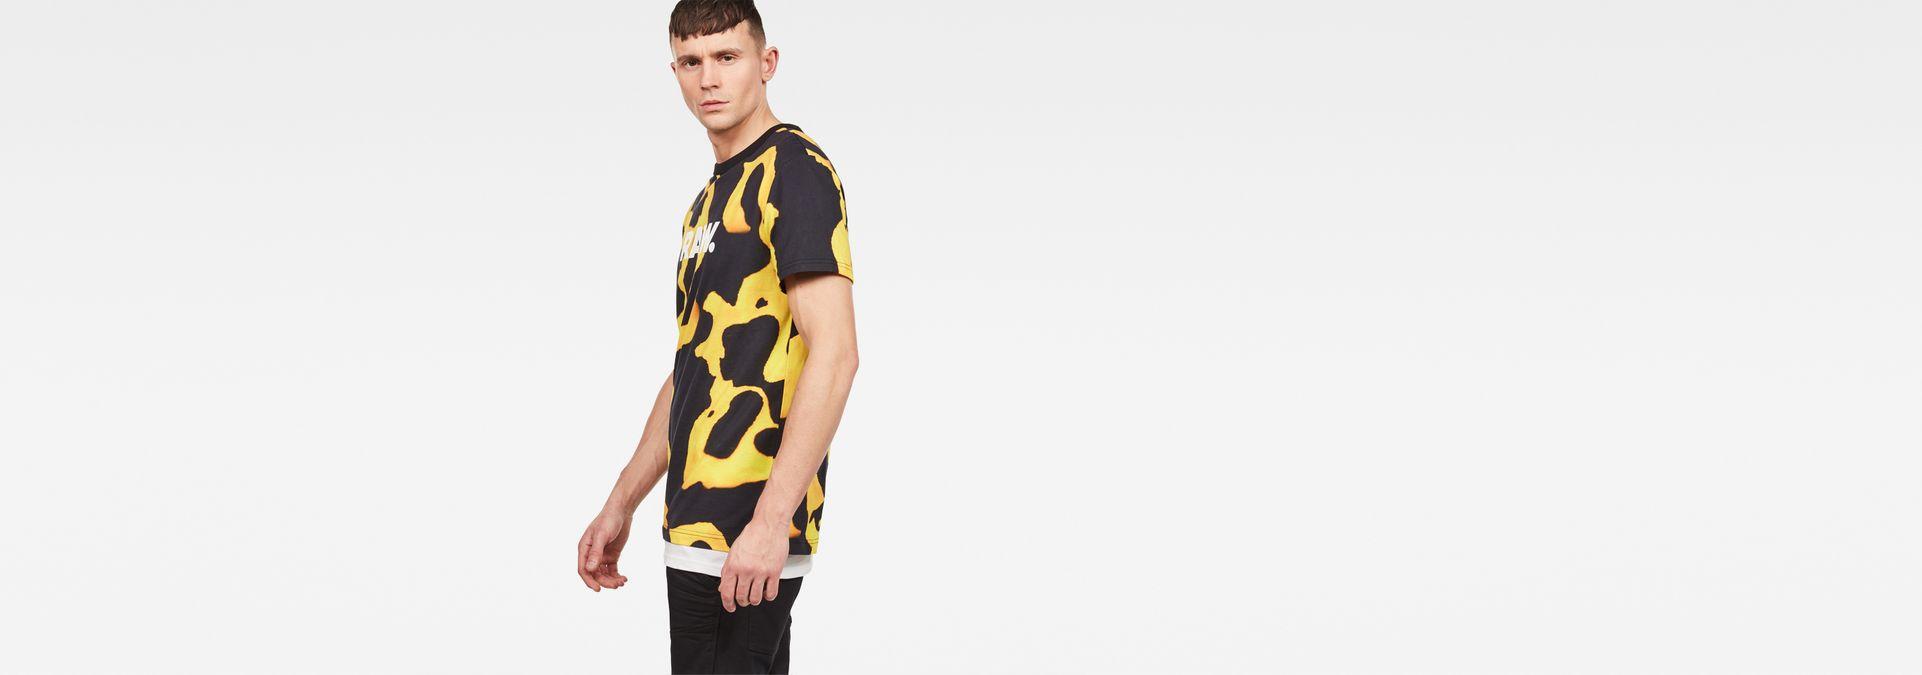 b2fddf936 ... G-Star RAW® Fian Bumble Frog Patterned T-Shirt Yellow model side ...